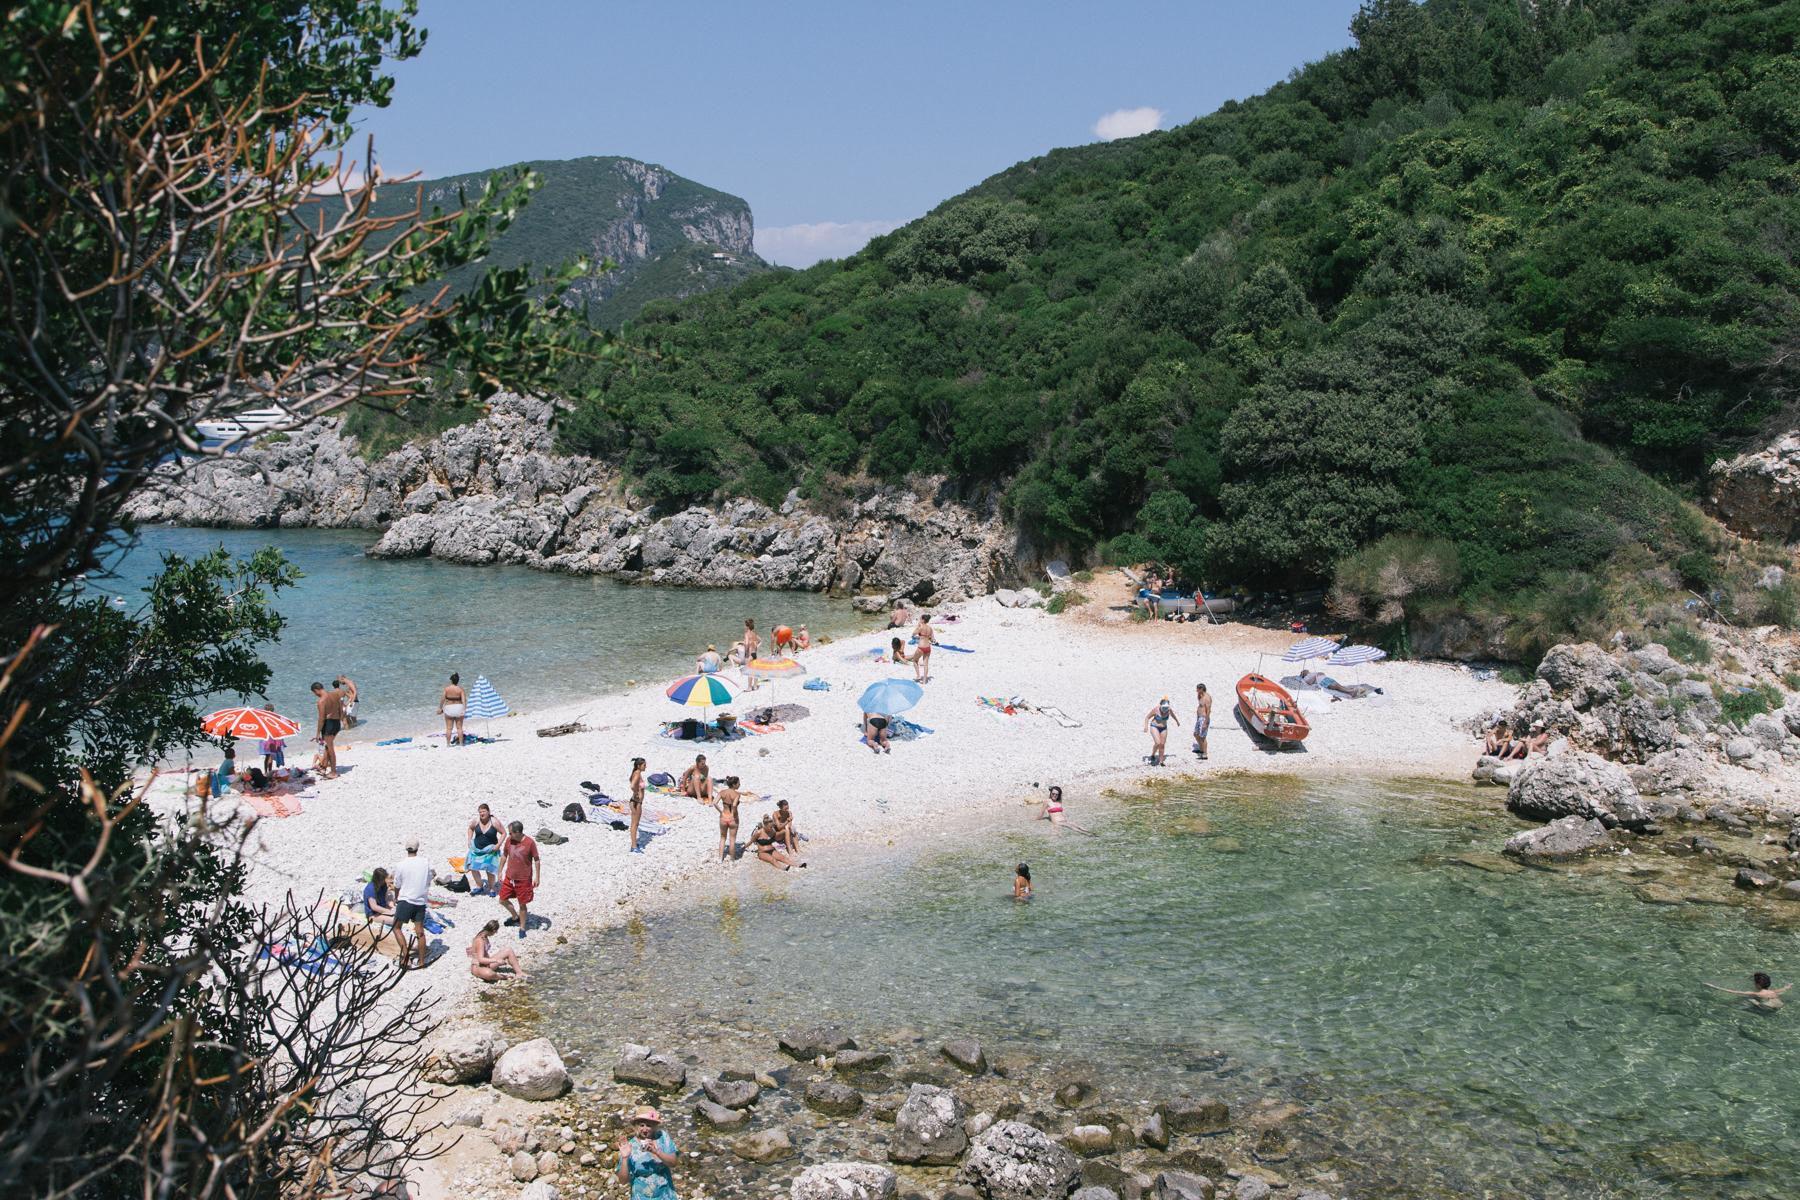 greece-corfu-6418.jpg